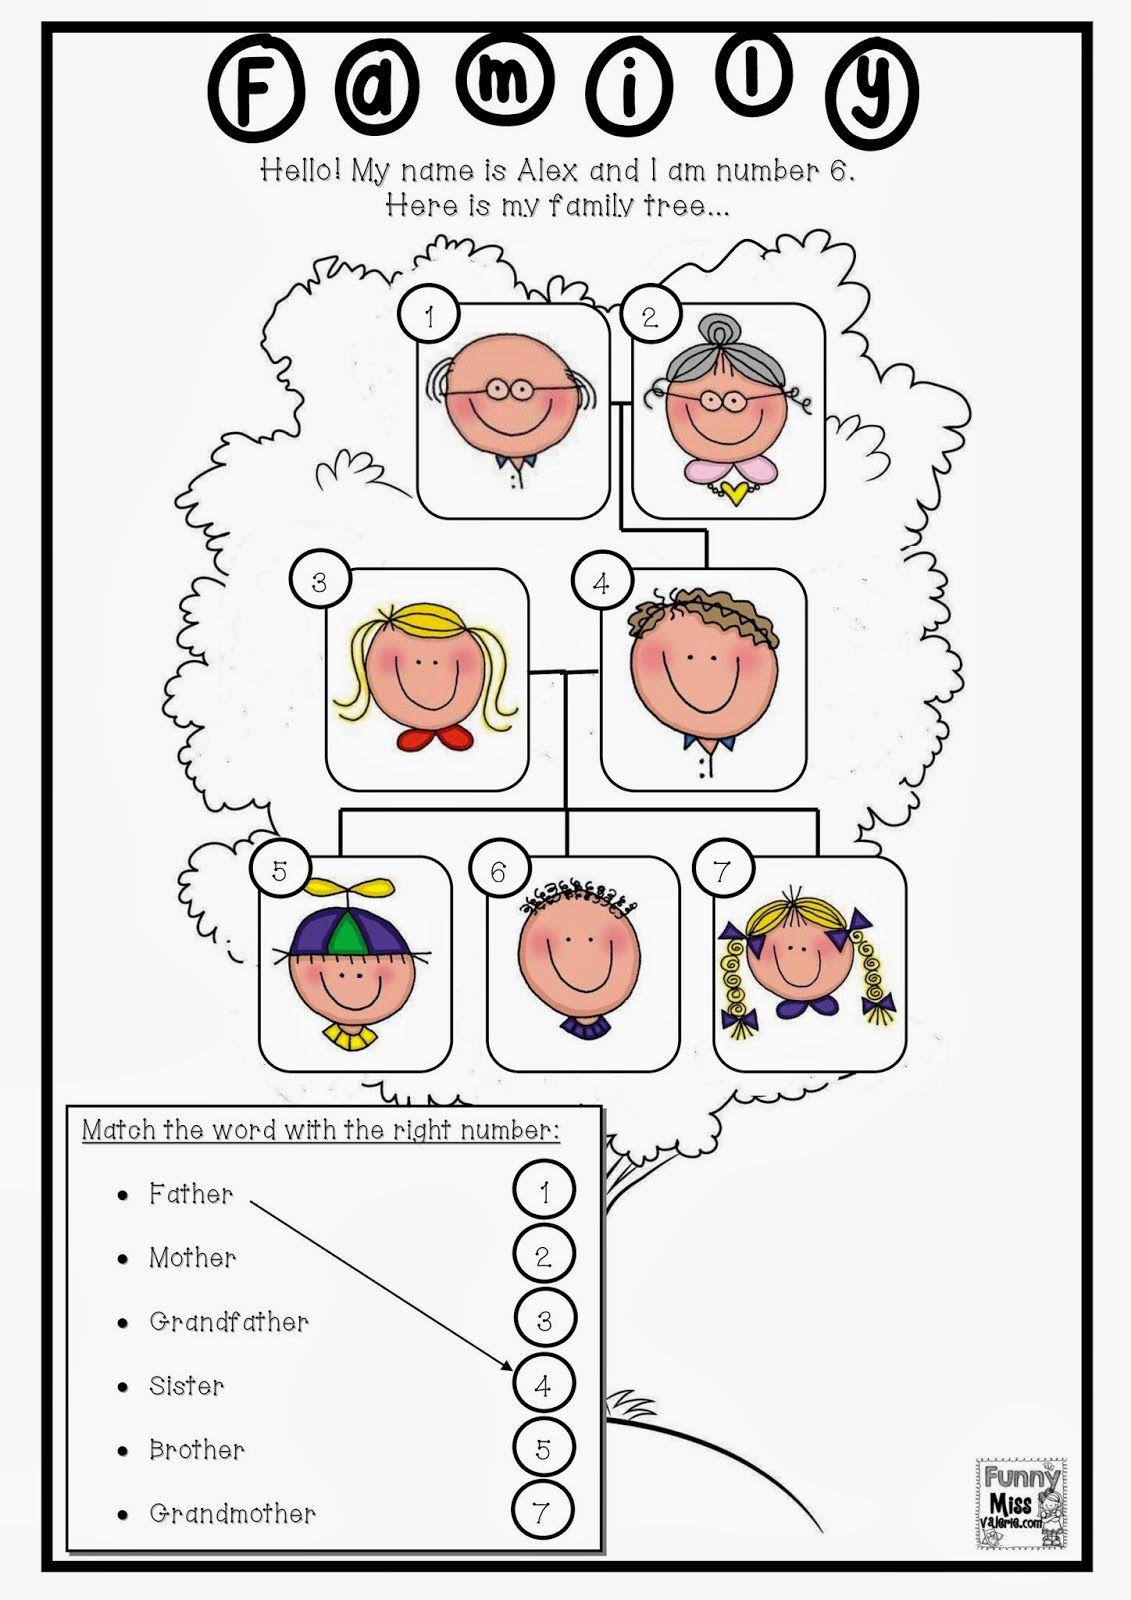 Enchanting Worksheets On Family For Grade 1 For Funny Miss Valà  Family  worksheet [ 1600 x 1131 Pixel ]